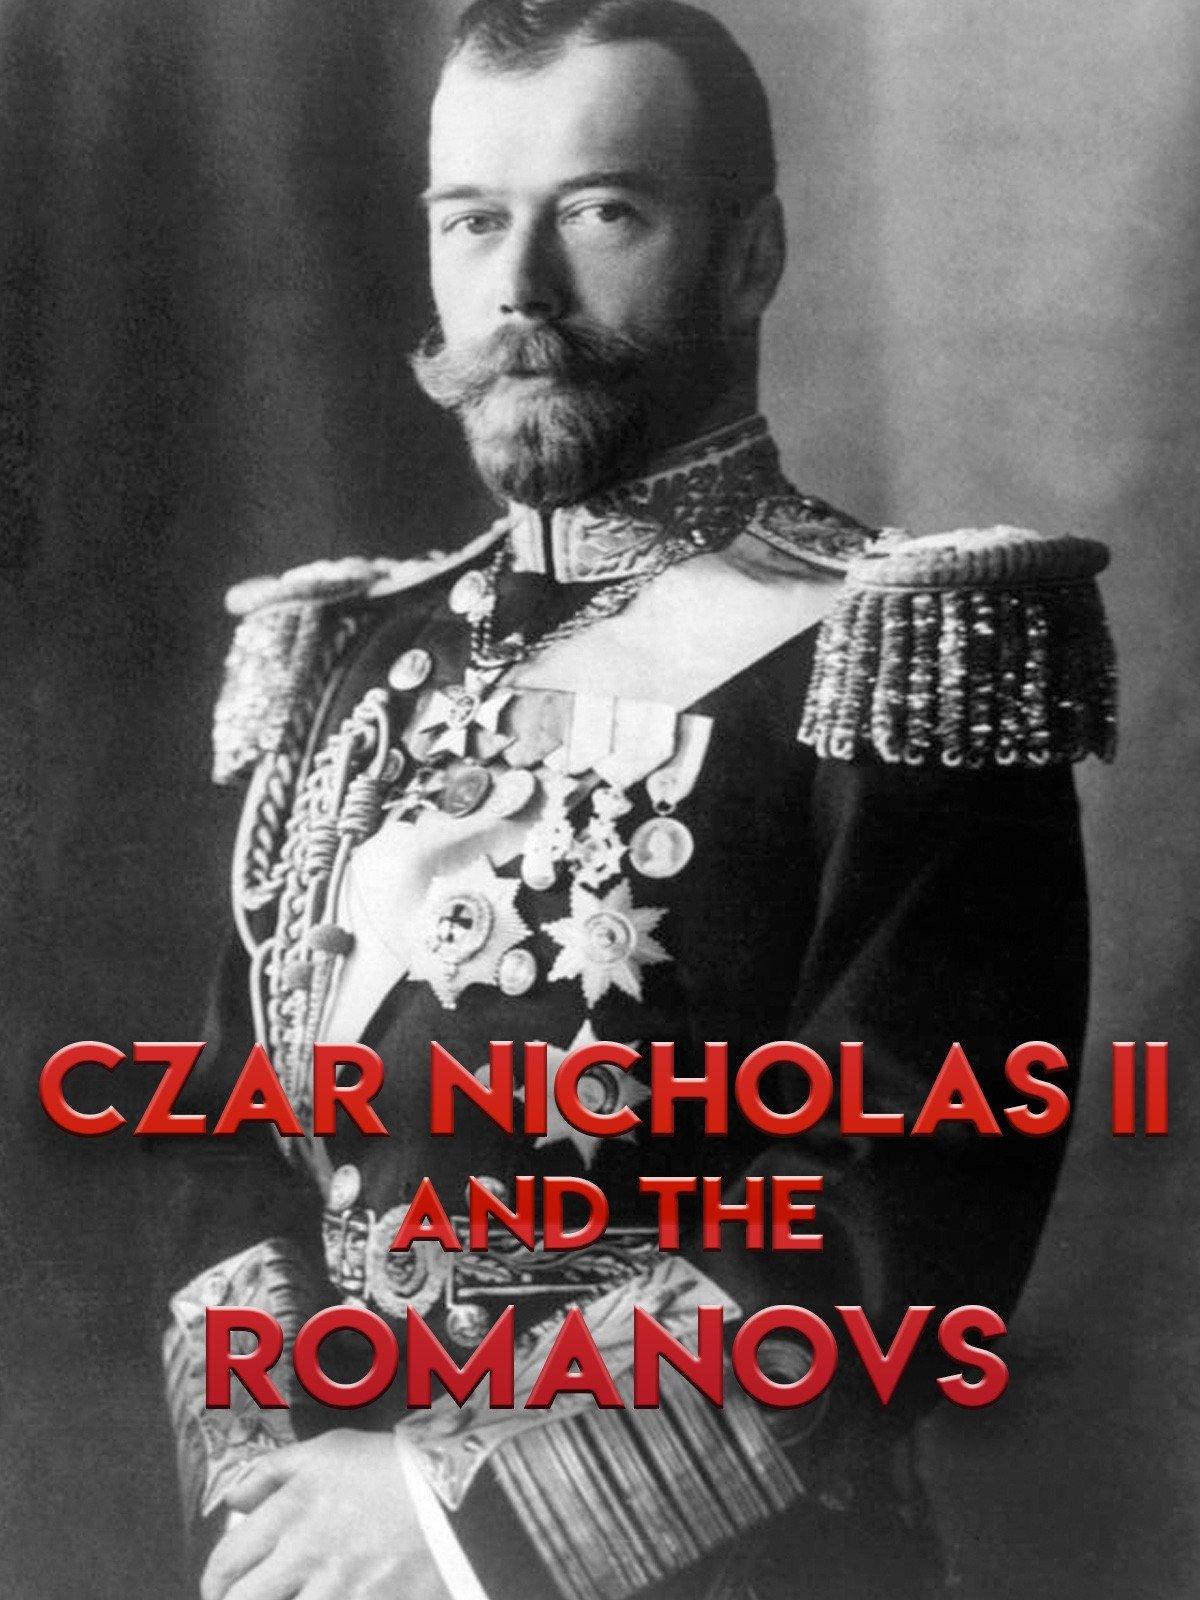 Czar Nicholas II And The Romanovs